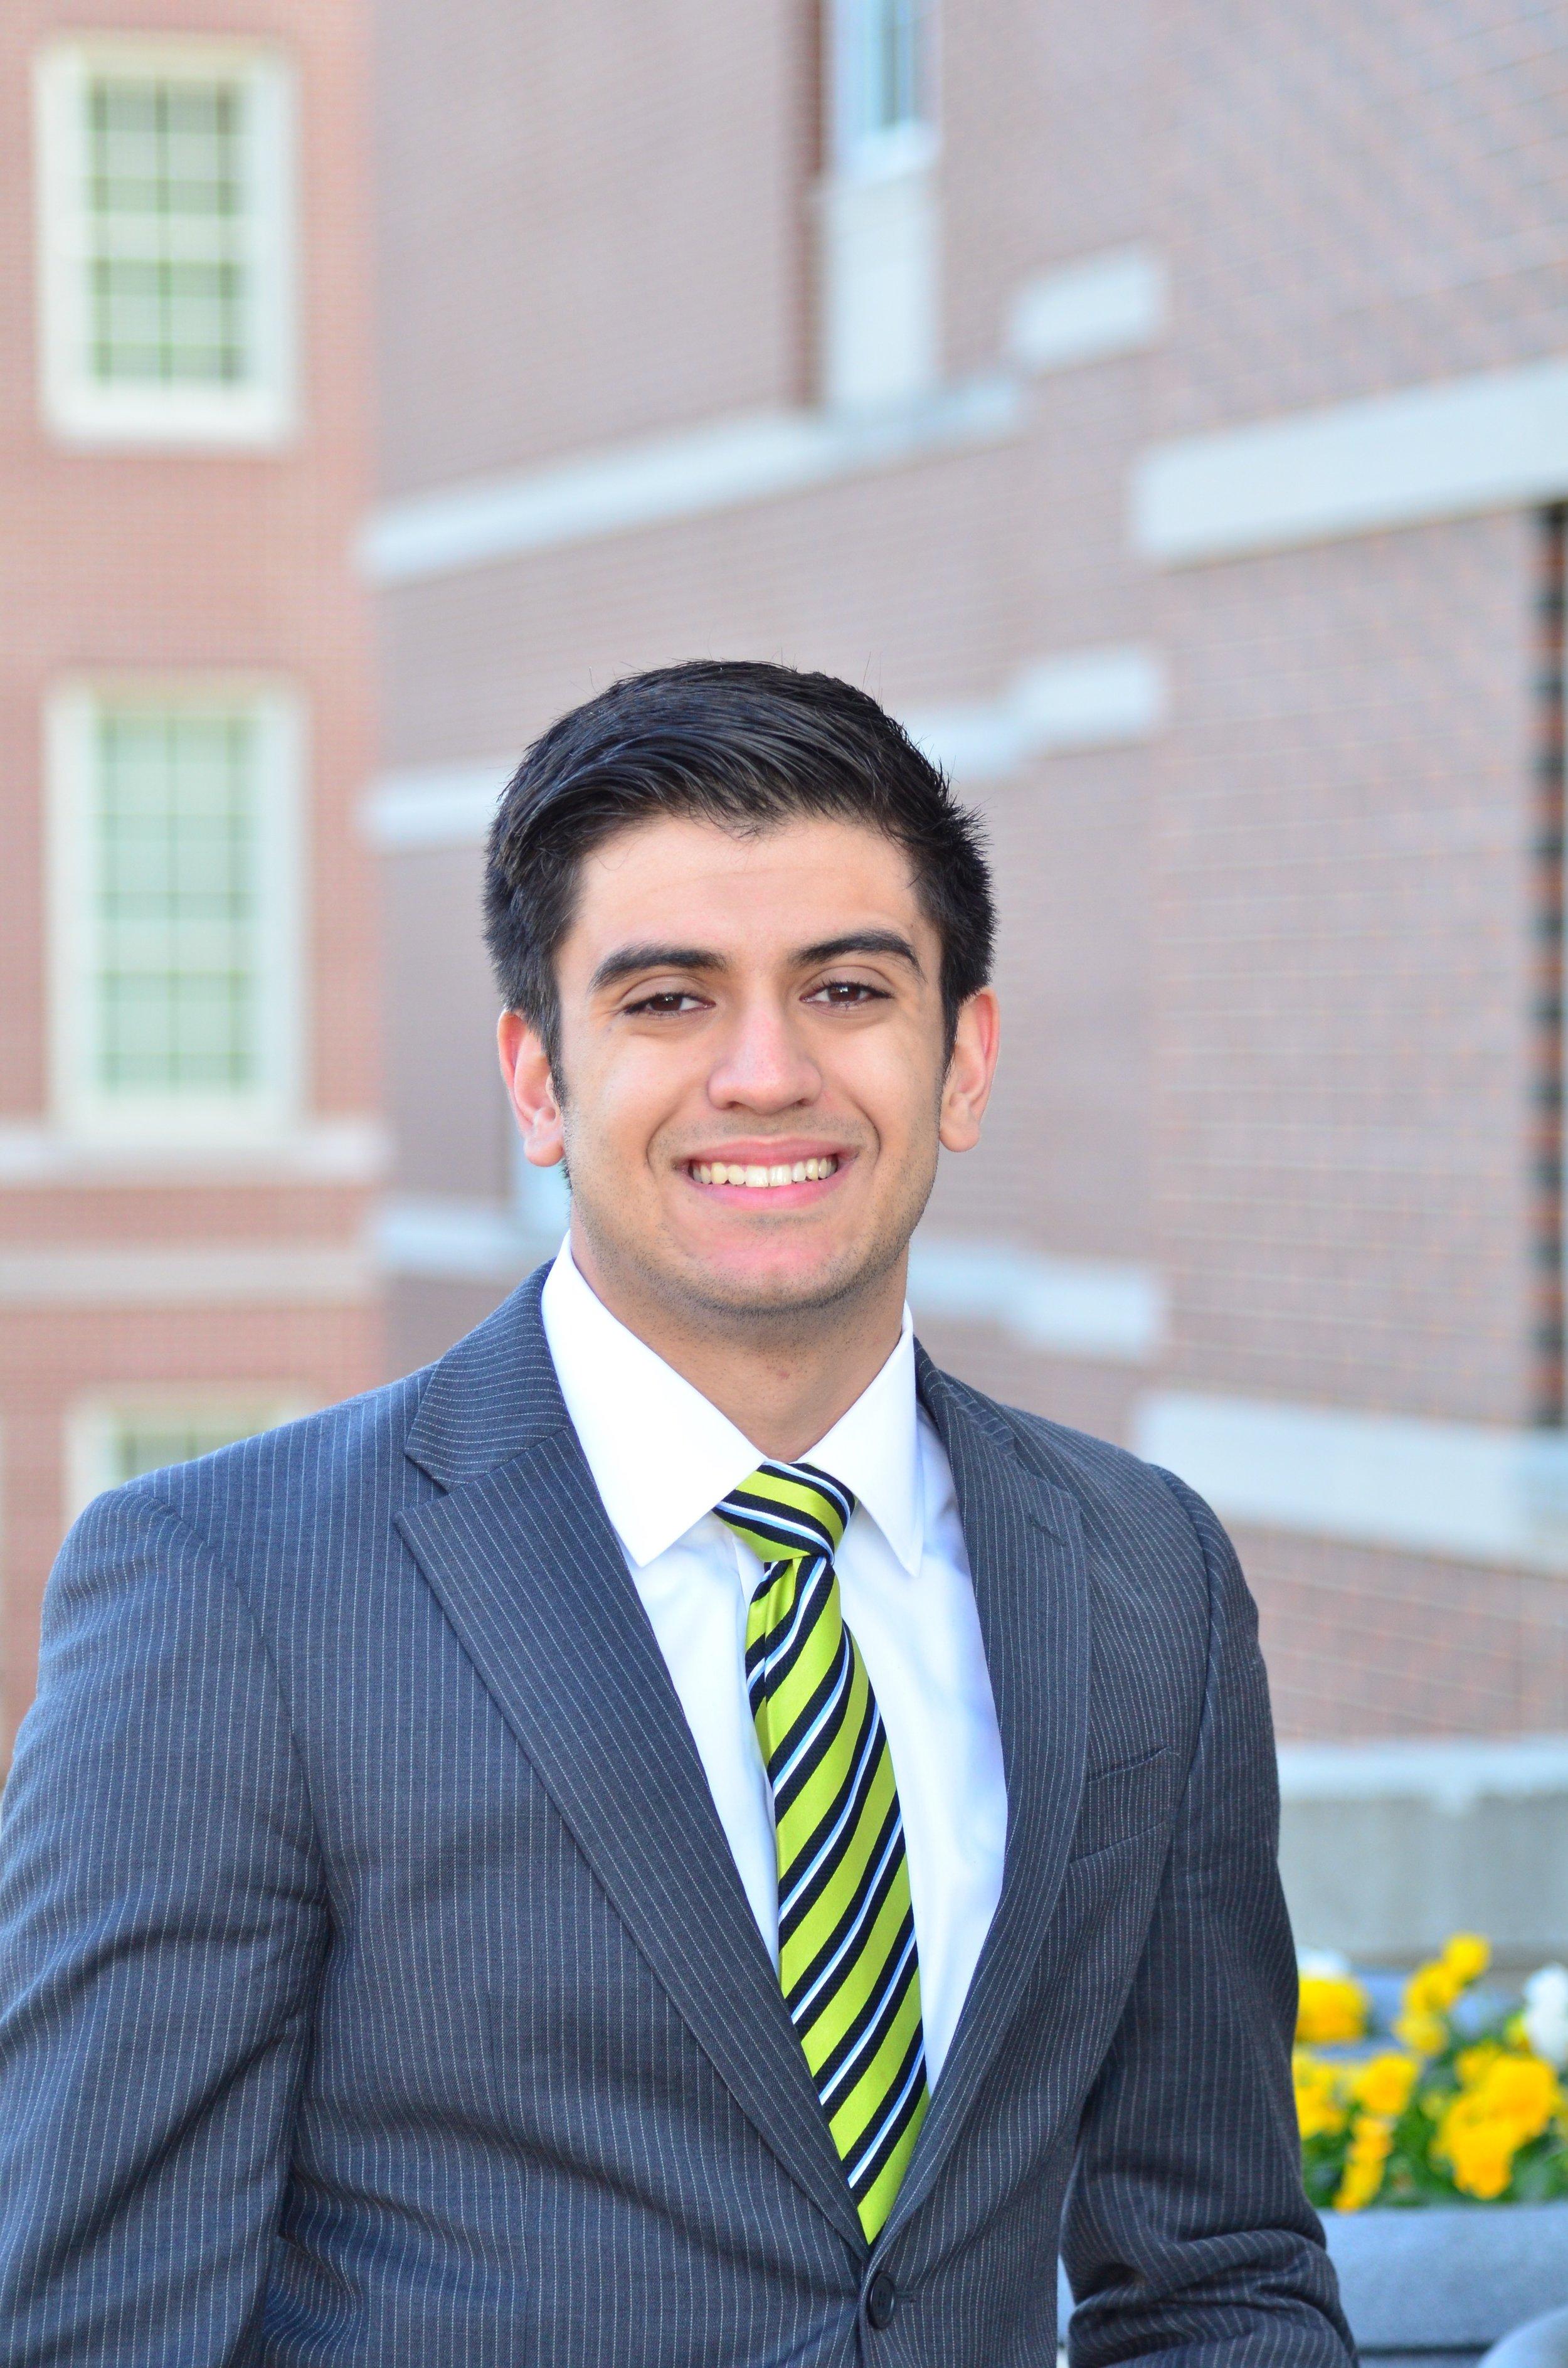 Abhi Gulati, Auburn University 2020